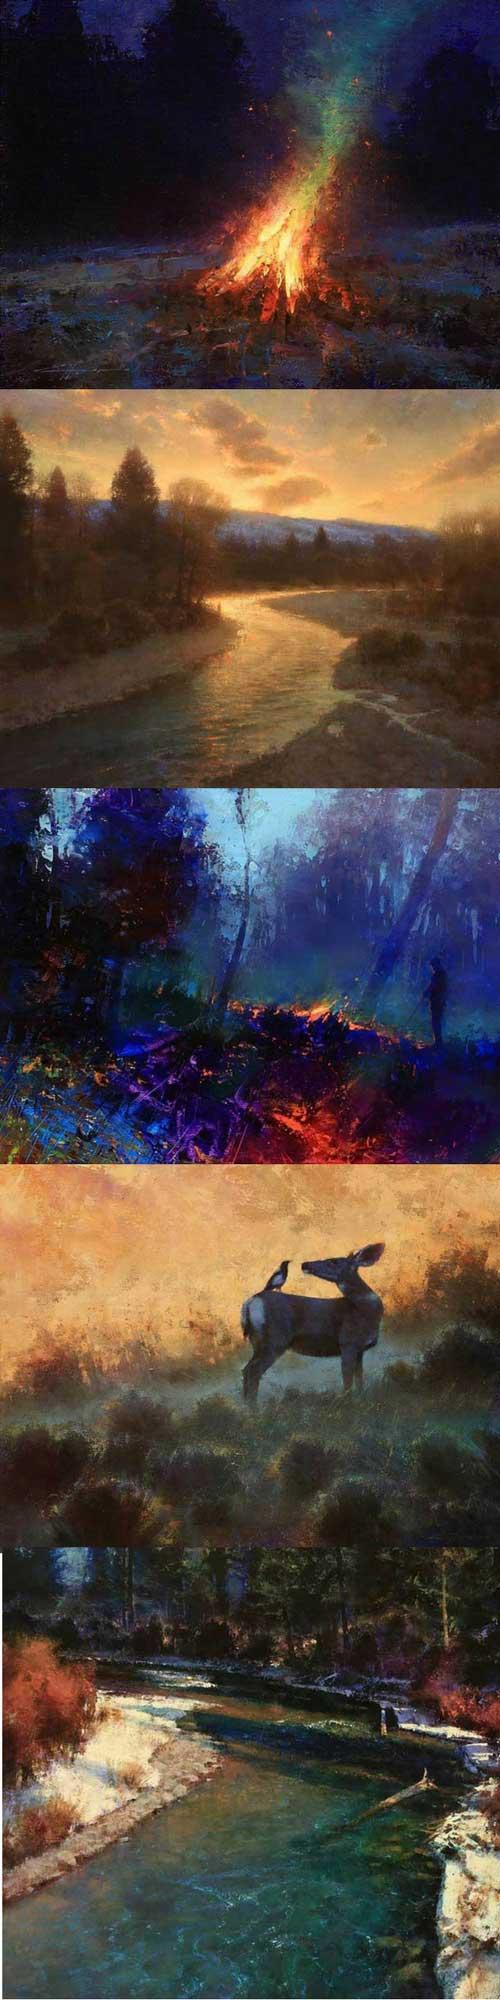 Artist Spotlight - Brent Cotton | Landscape Painting | Art Ideas | Landscape Ideas | Painting Ideas | Art Inspiration